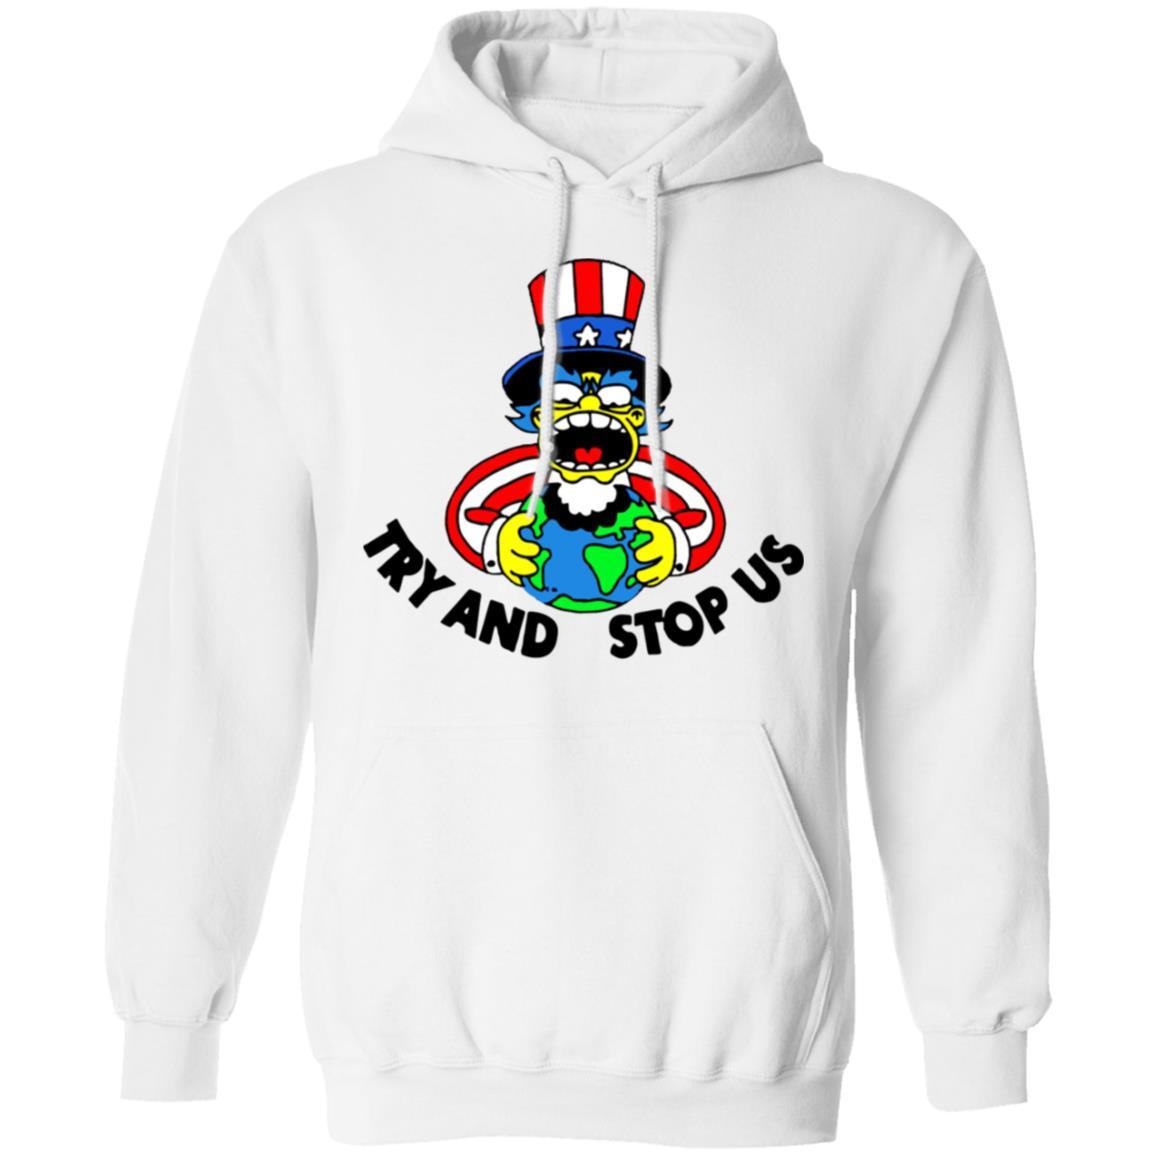 Z66 Pullover Hoodie